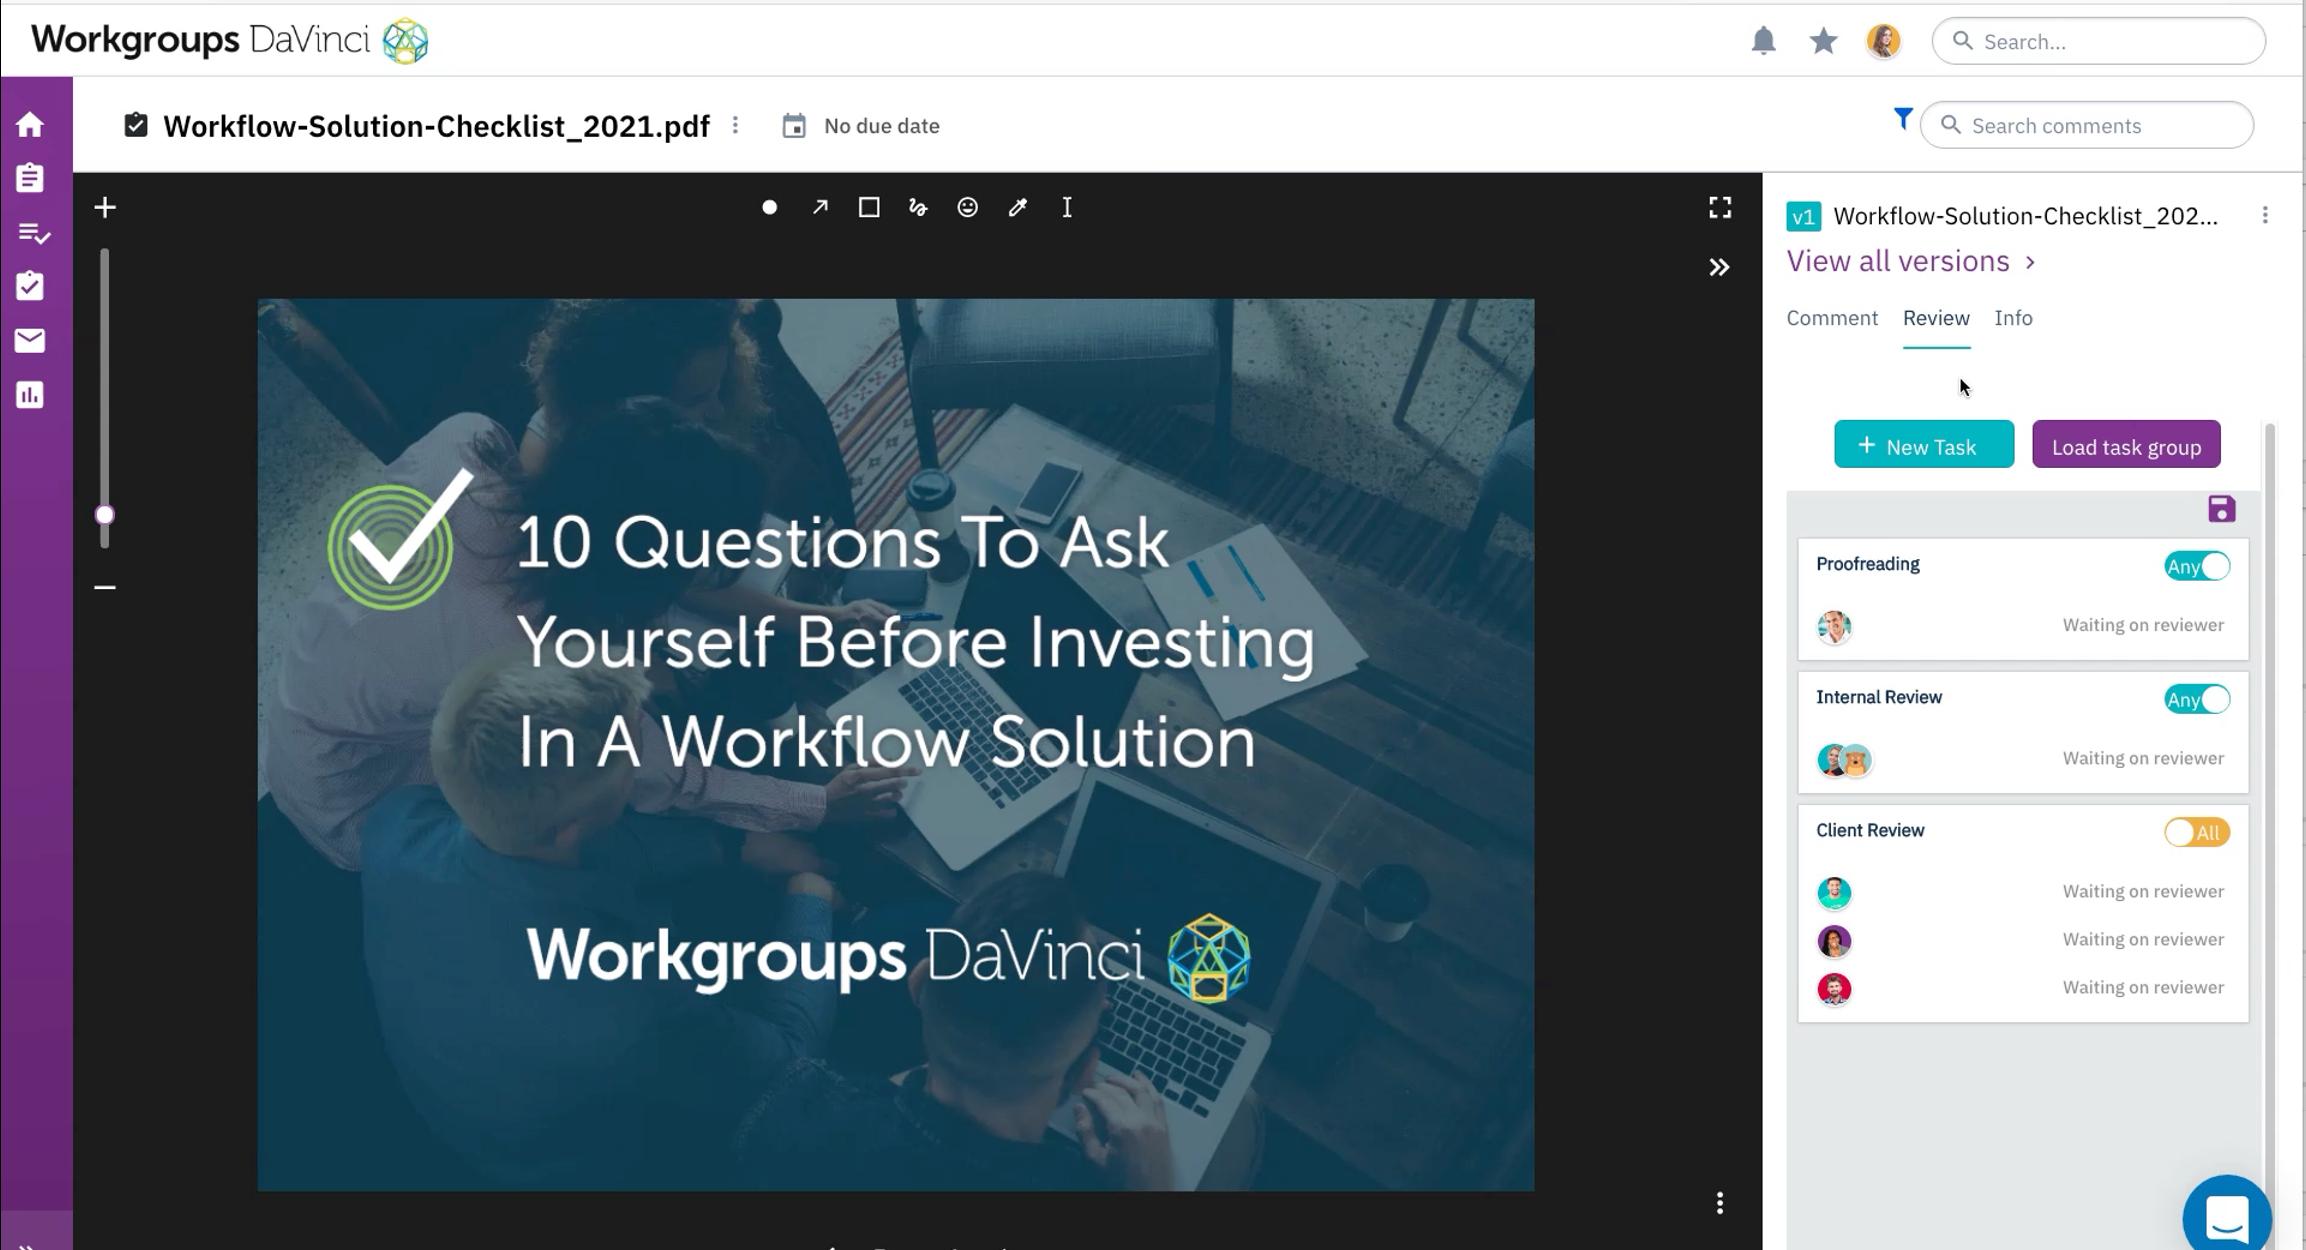 Workgroups DaVinci Logiciel - 2